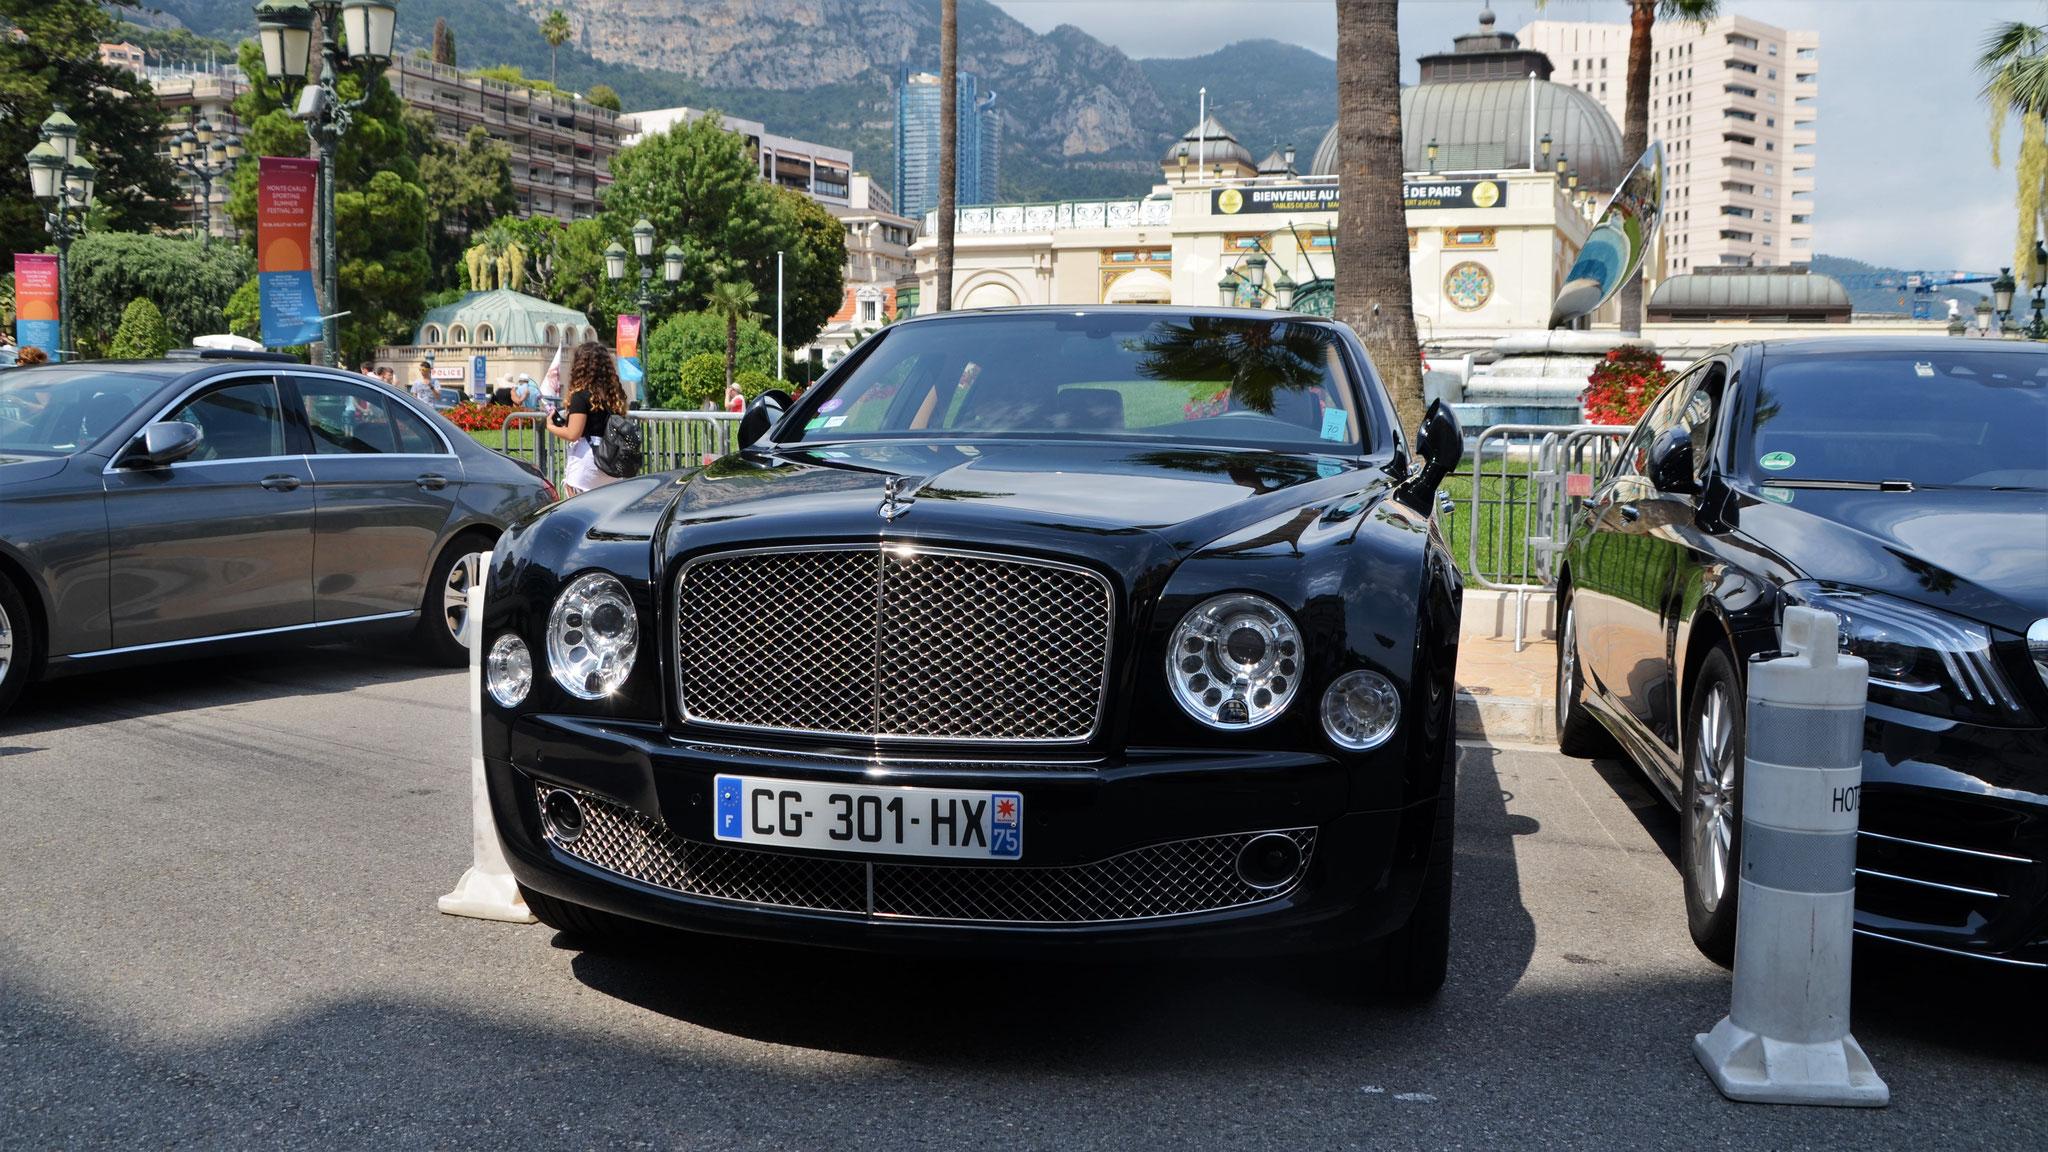 Bentley Mulsanne - CG-301-HX-75 (FRA)